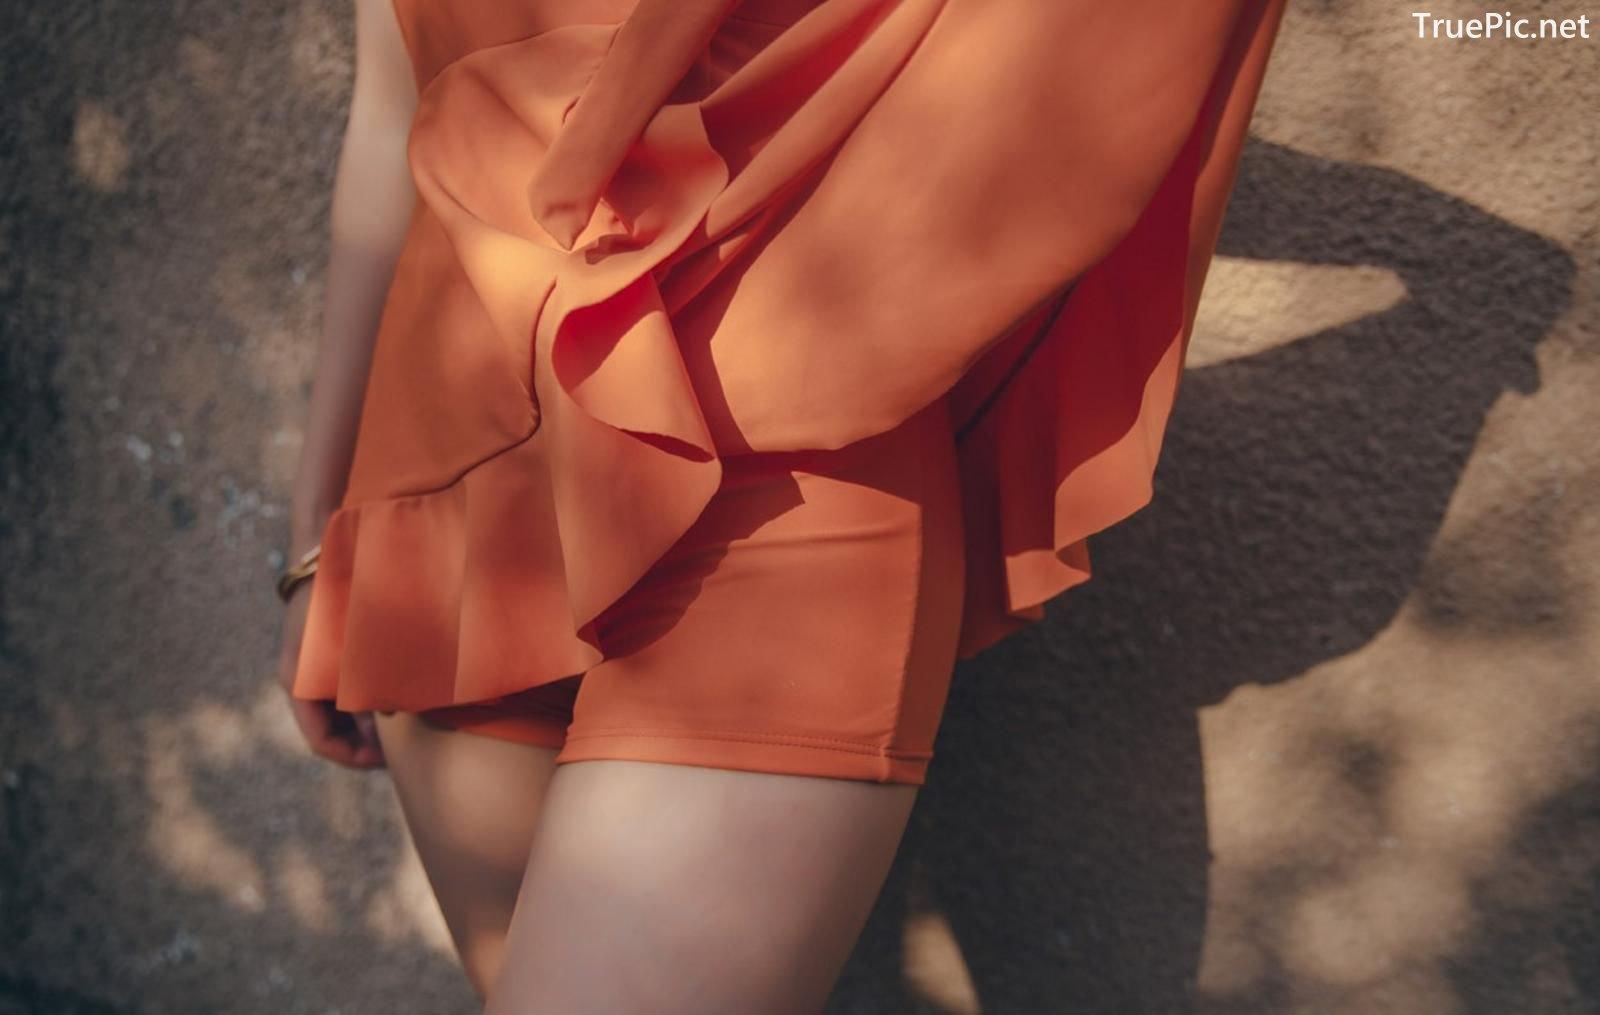 Image Korean Fashion Model - Lee Chae Eun - Sienna One Piece Swimsuit - TruePic.net - Picture-22